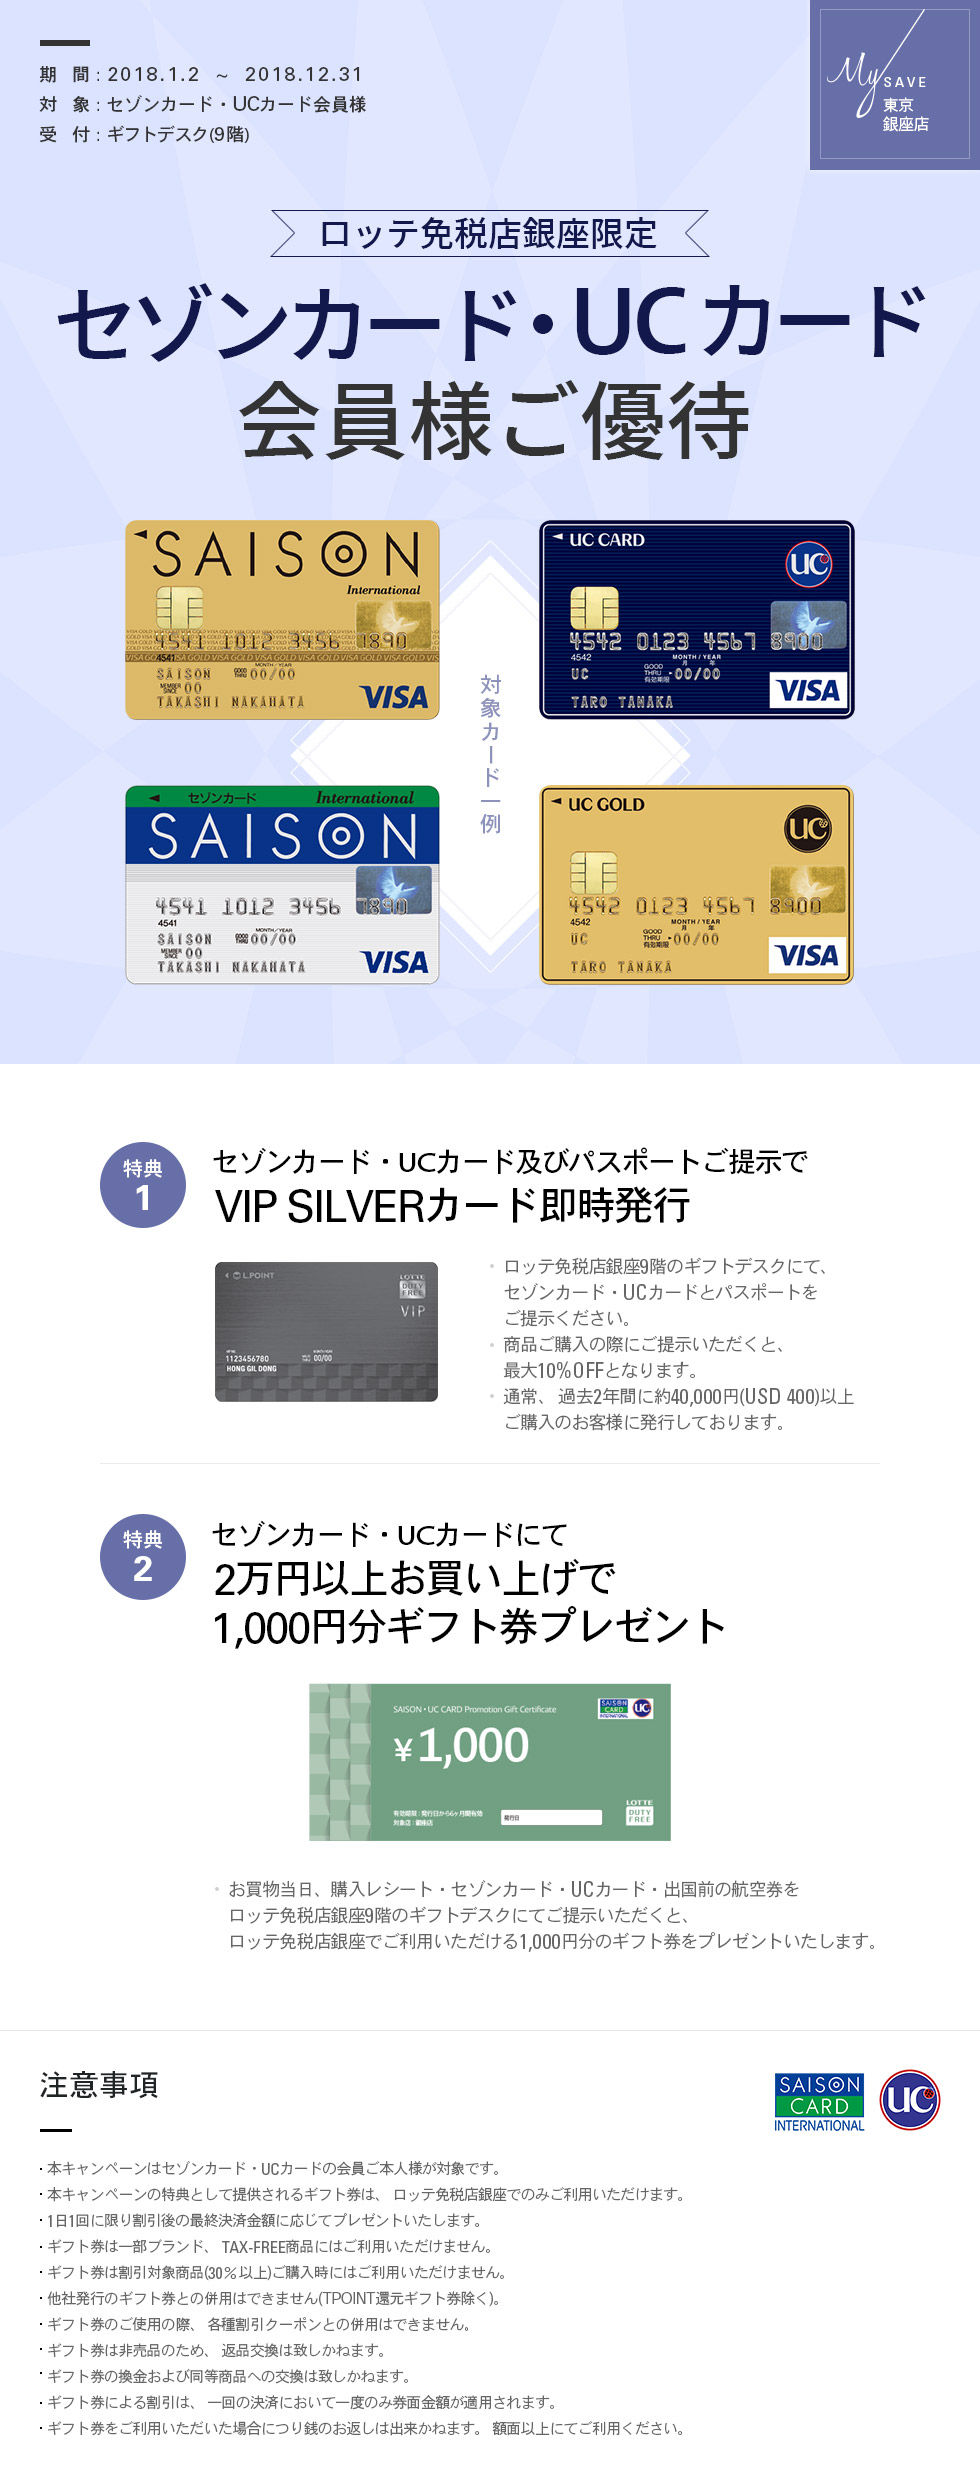 SAISONカード・UCカード会員様ご優待